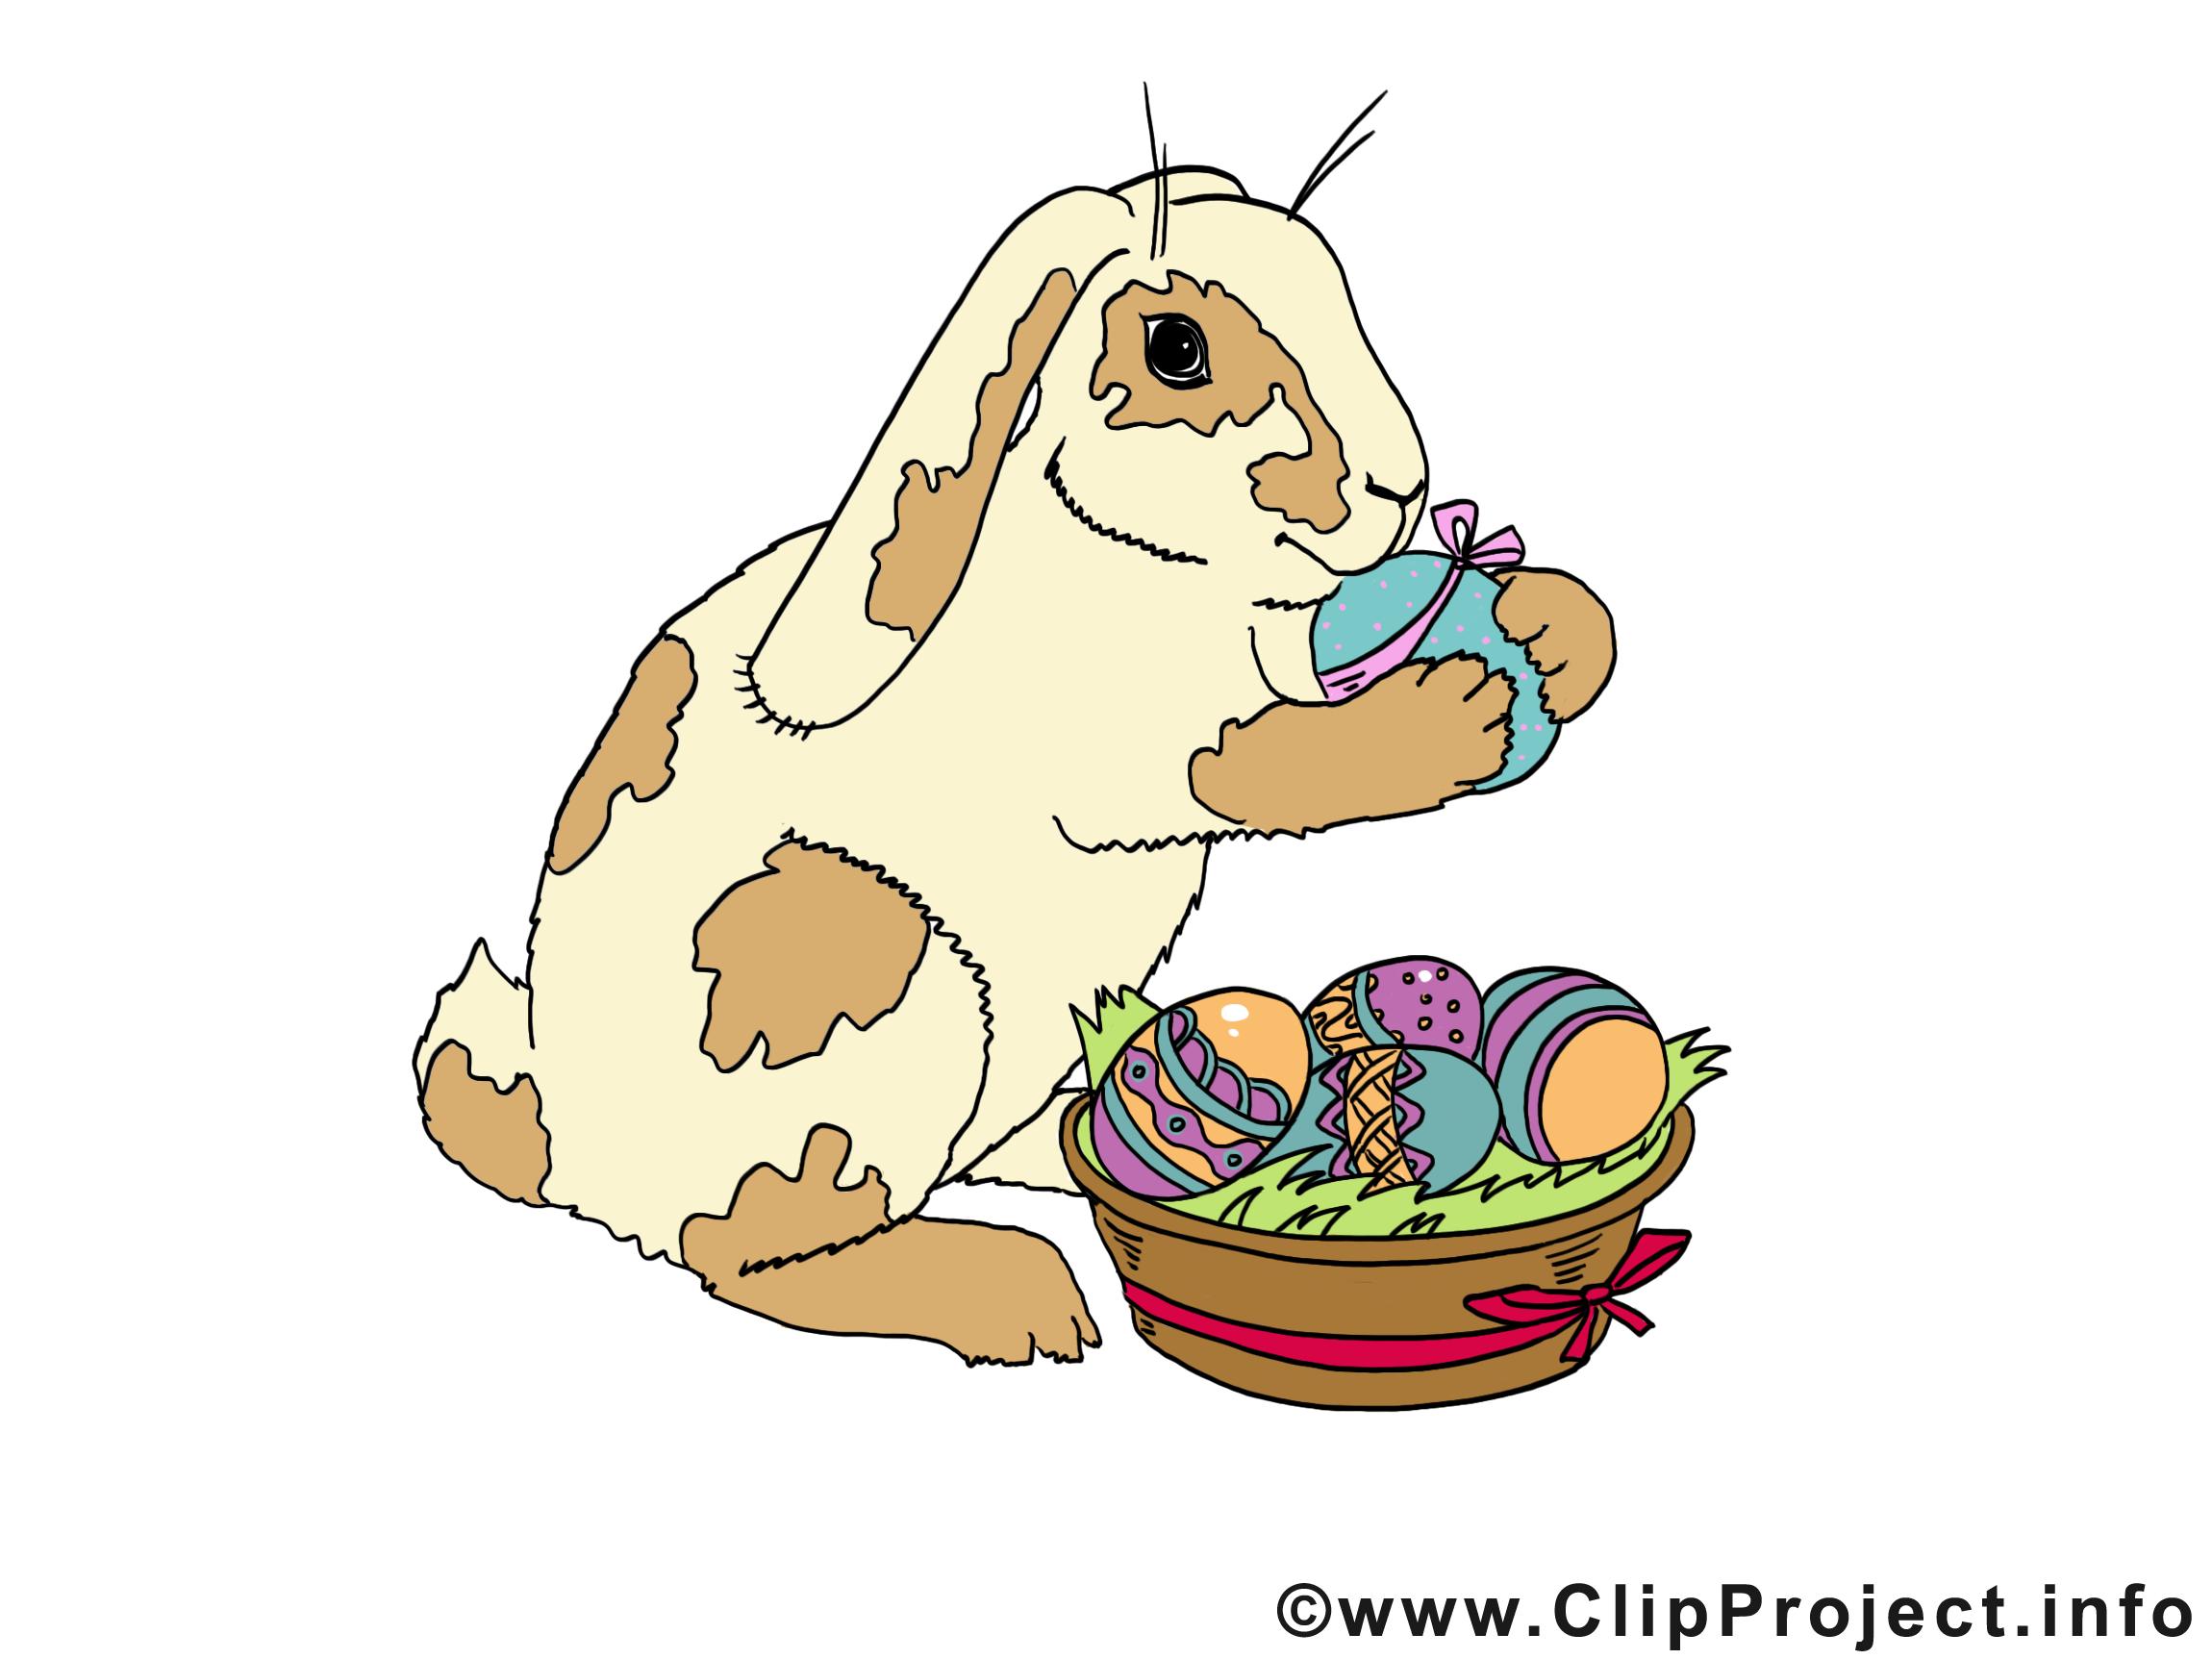 Lapin illustration Pâques images